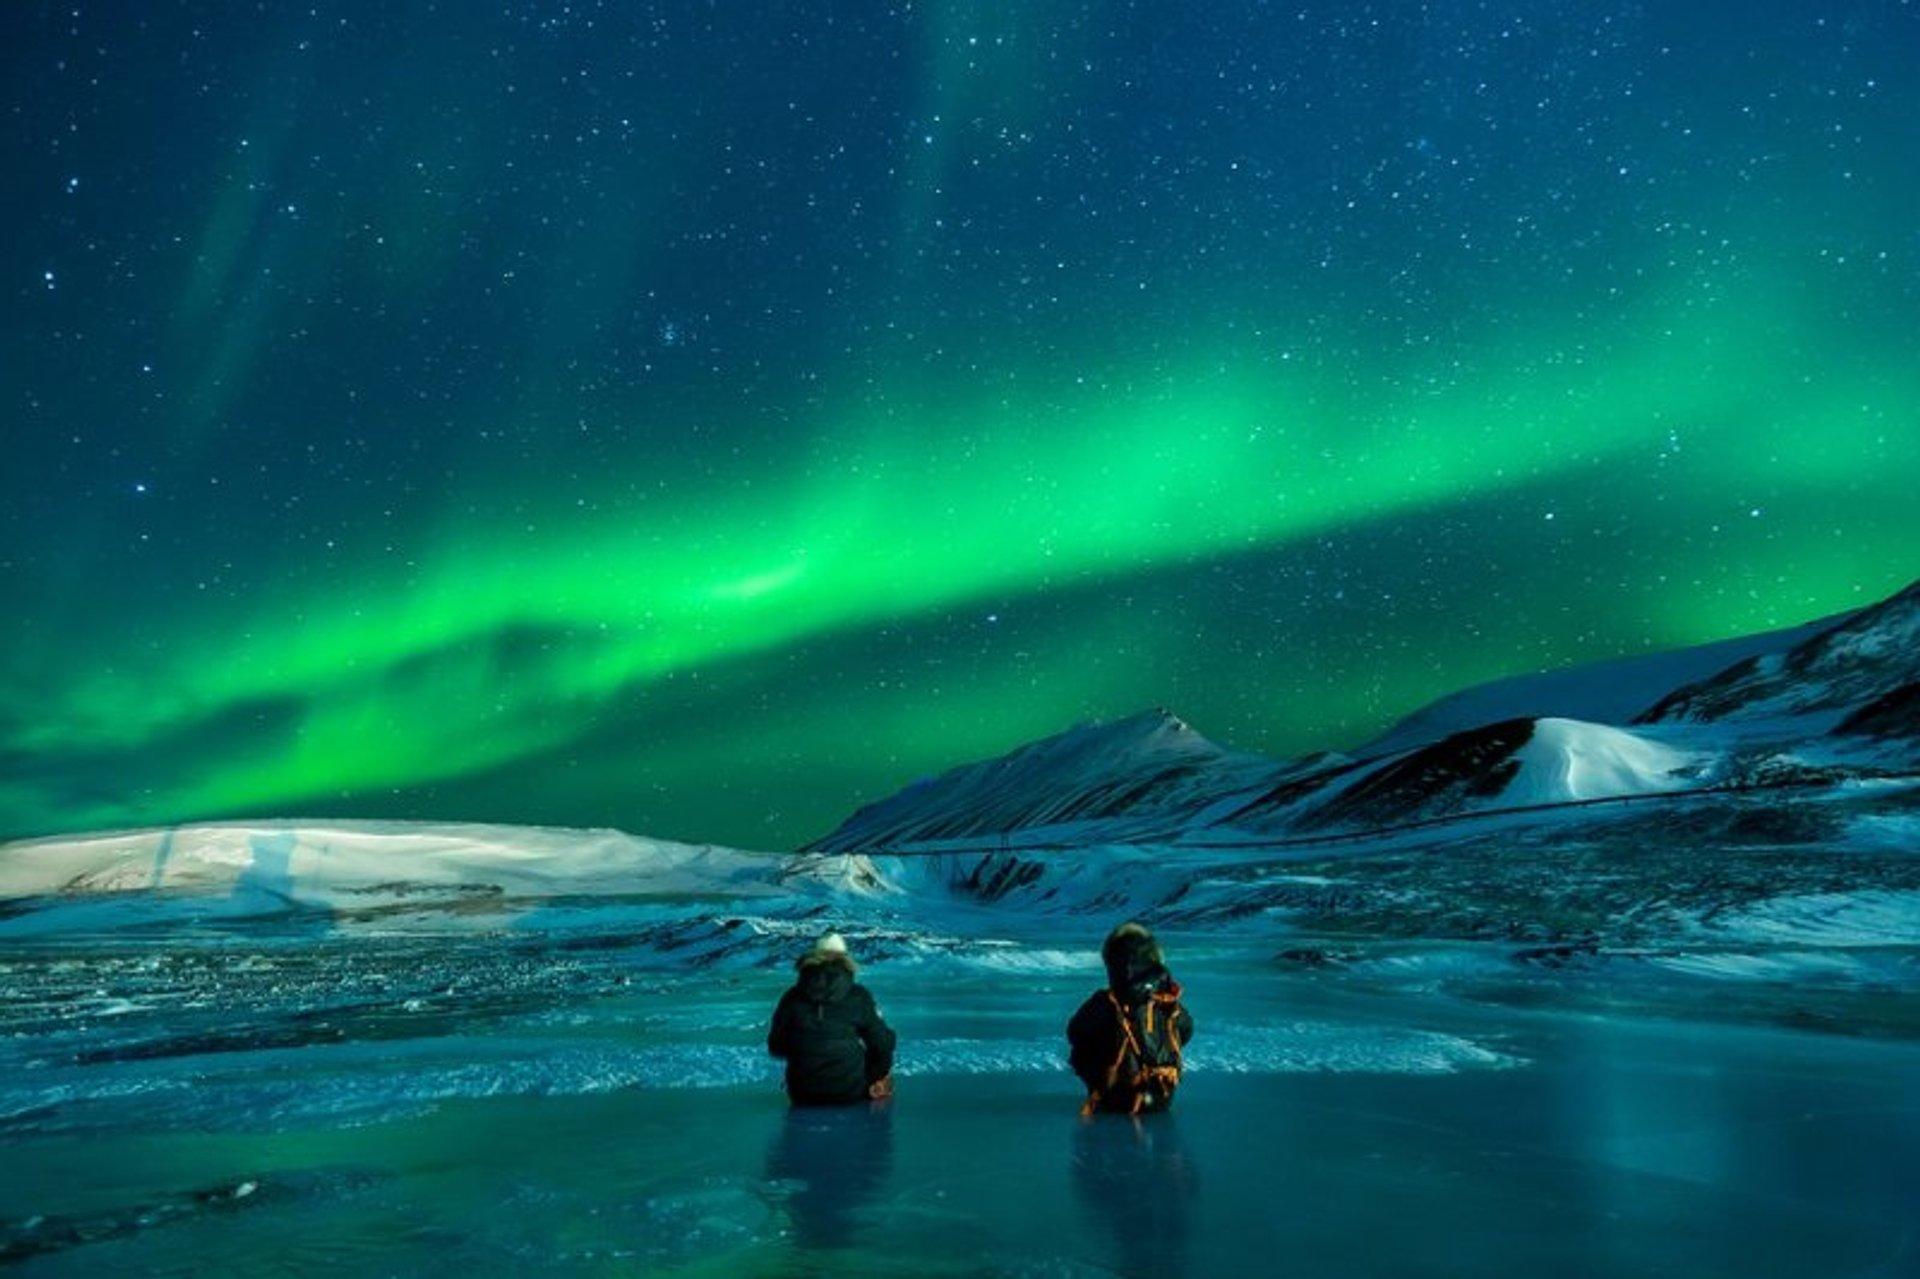 Northern or Polar Lights in Norway - Best Season 2020